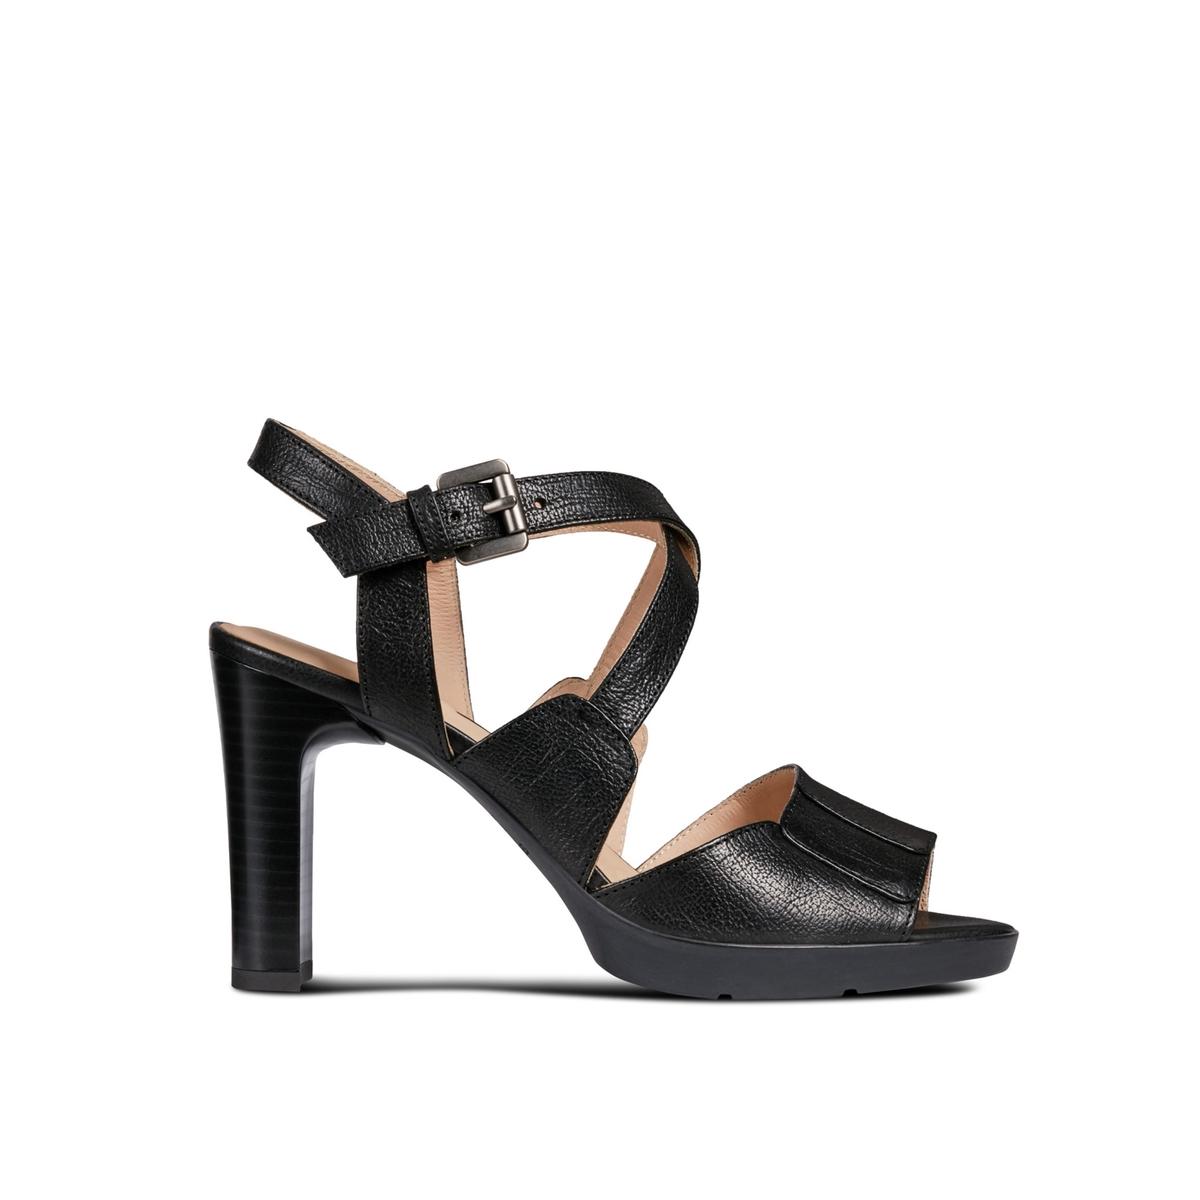 Sandalias de piel Annya High Sandal